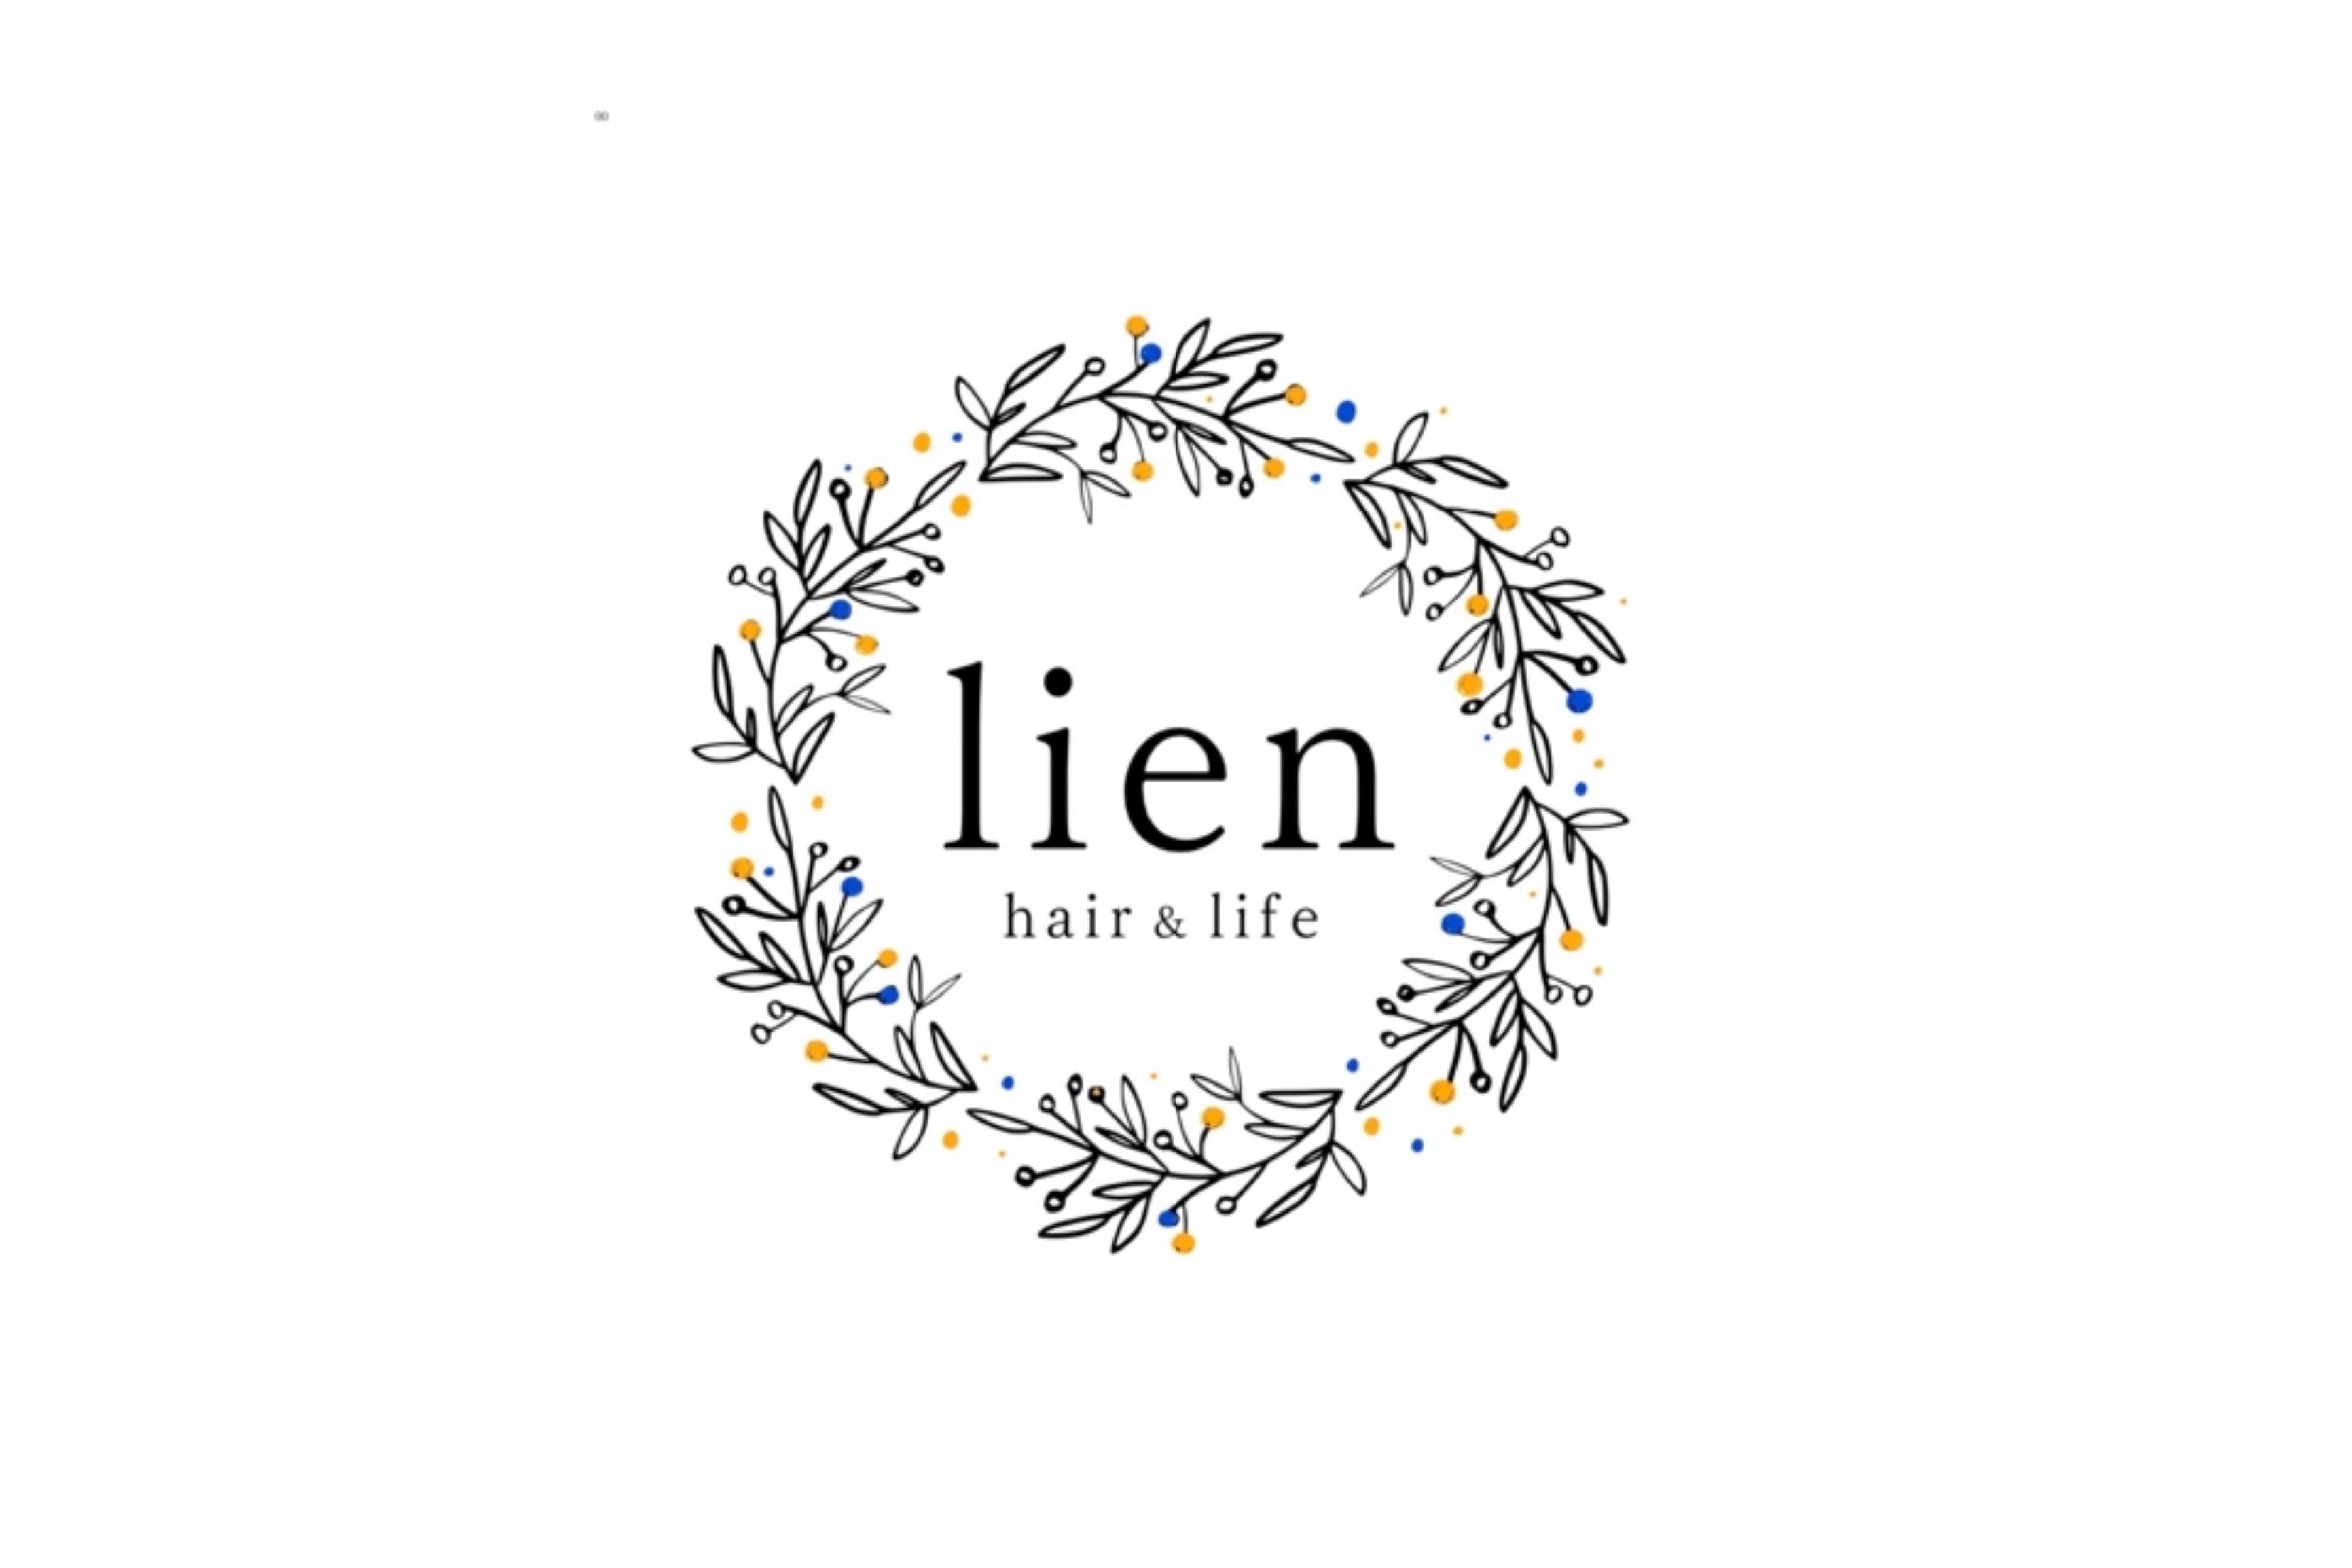 f:id:lien-hair-life:20190917080203j:image